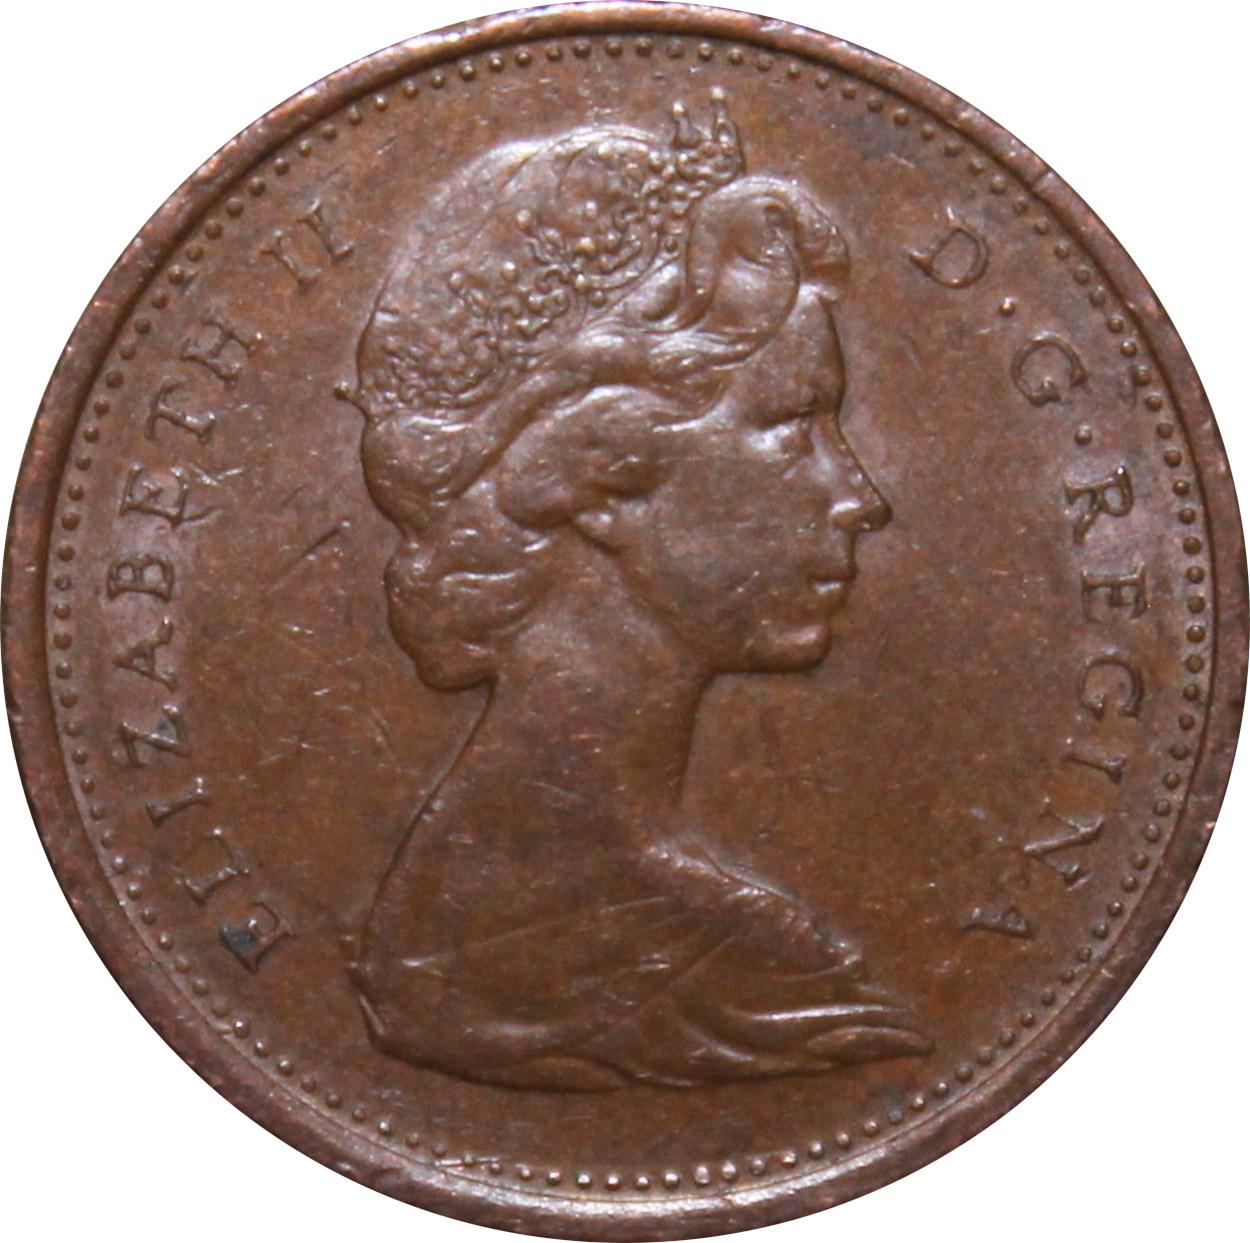 EF-40 - 1 cent 1965 to 1989 - Elizabeth II